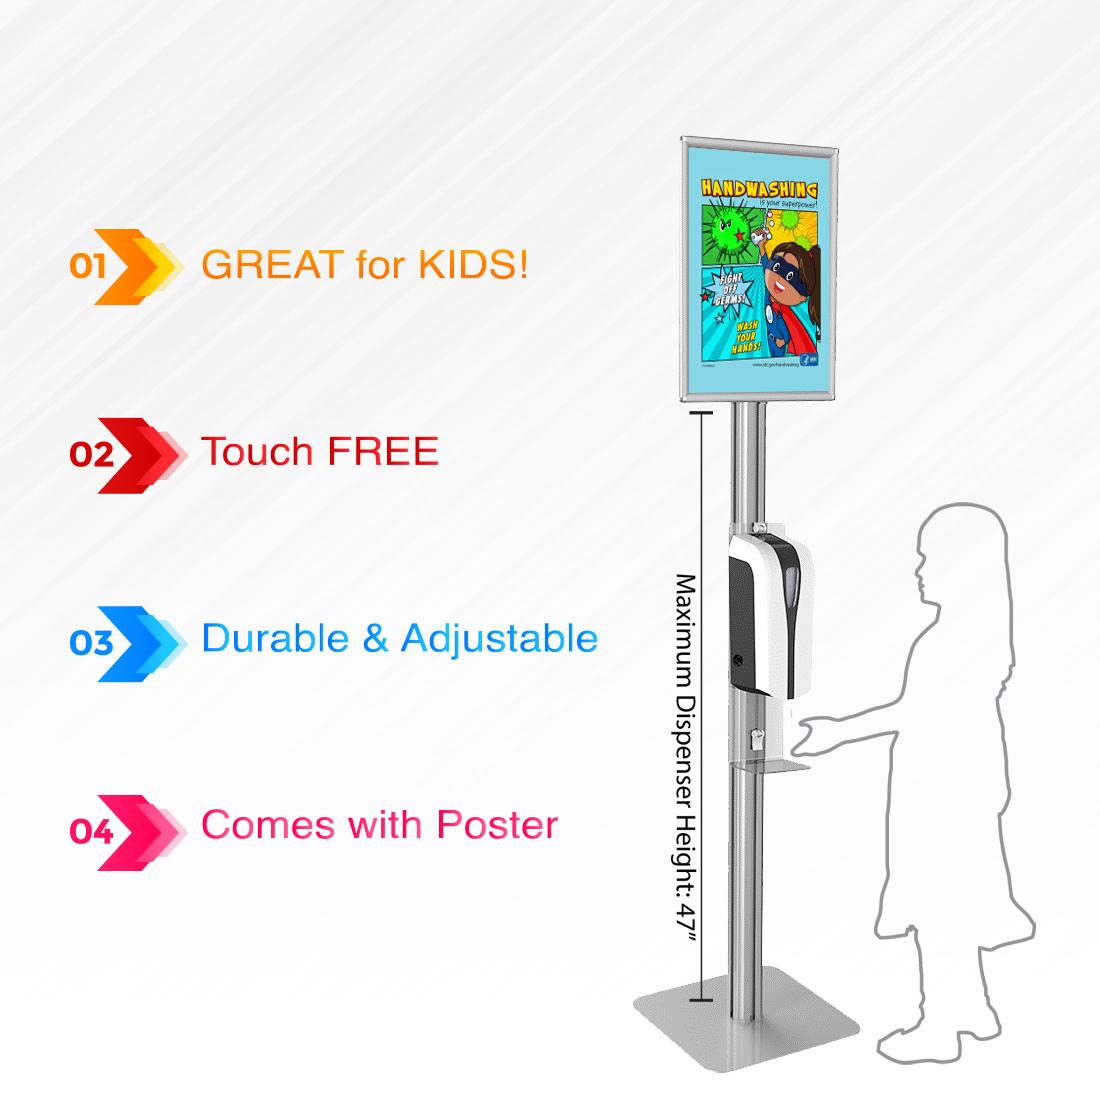 Hand Sanitizer for KIDS